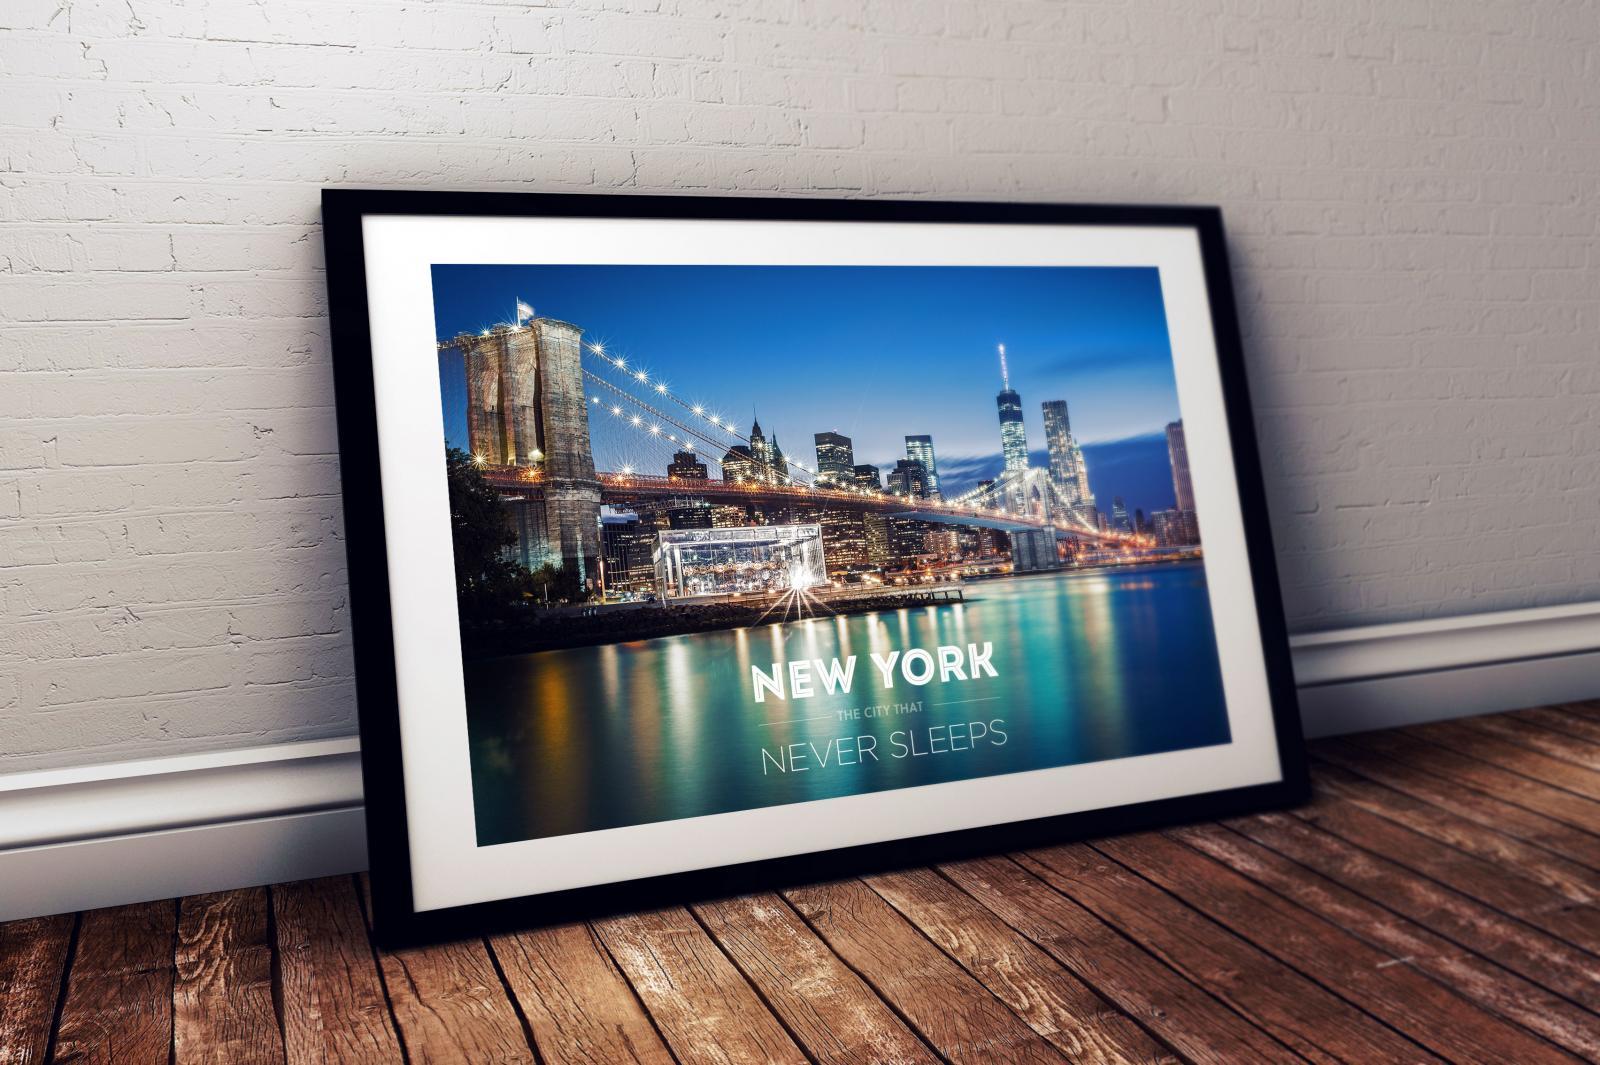 new york poster gro e auswahl g nstige preise. Black Bedroom Furniture Sets. Home Design Ideas